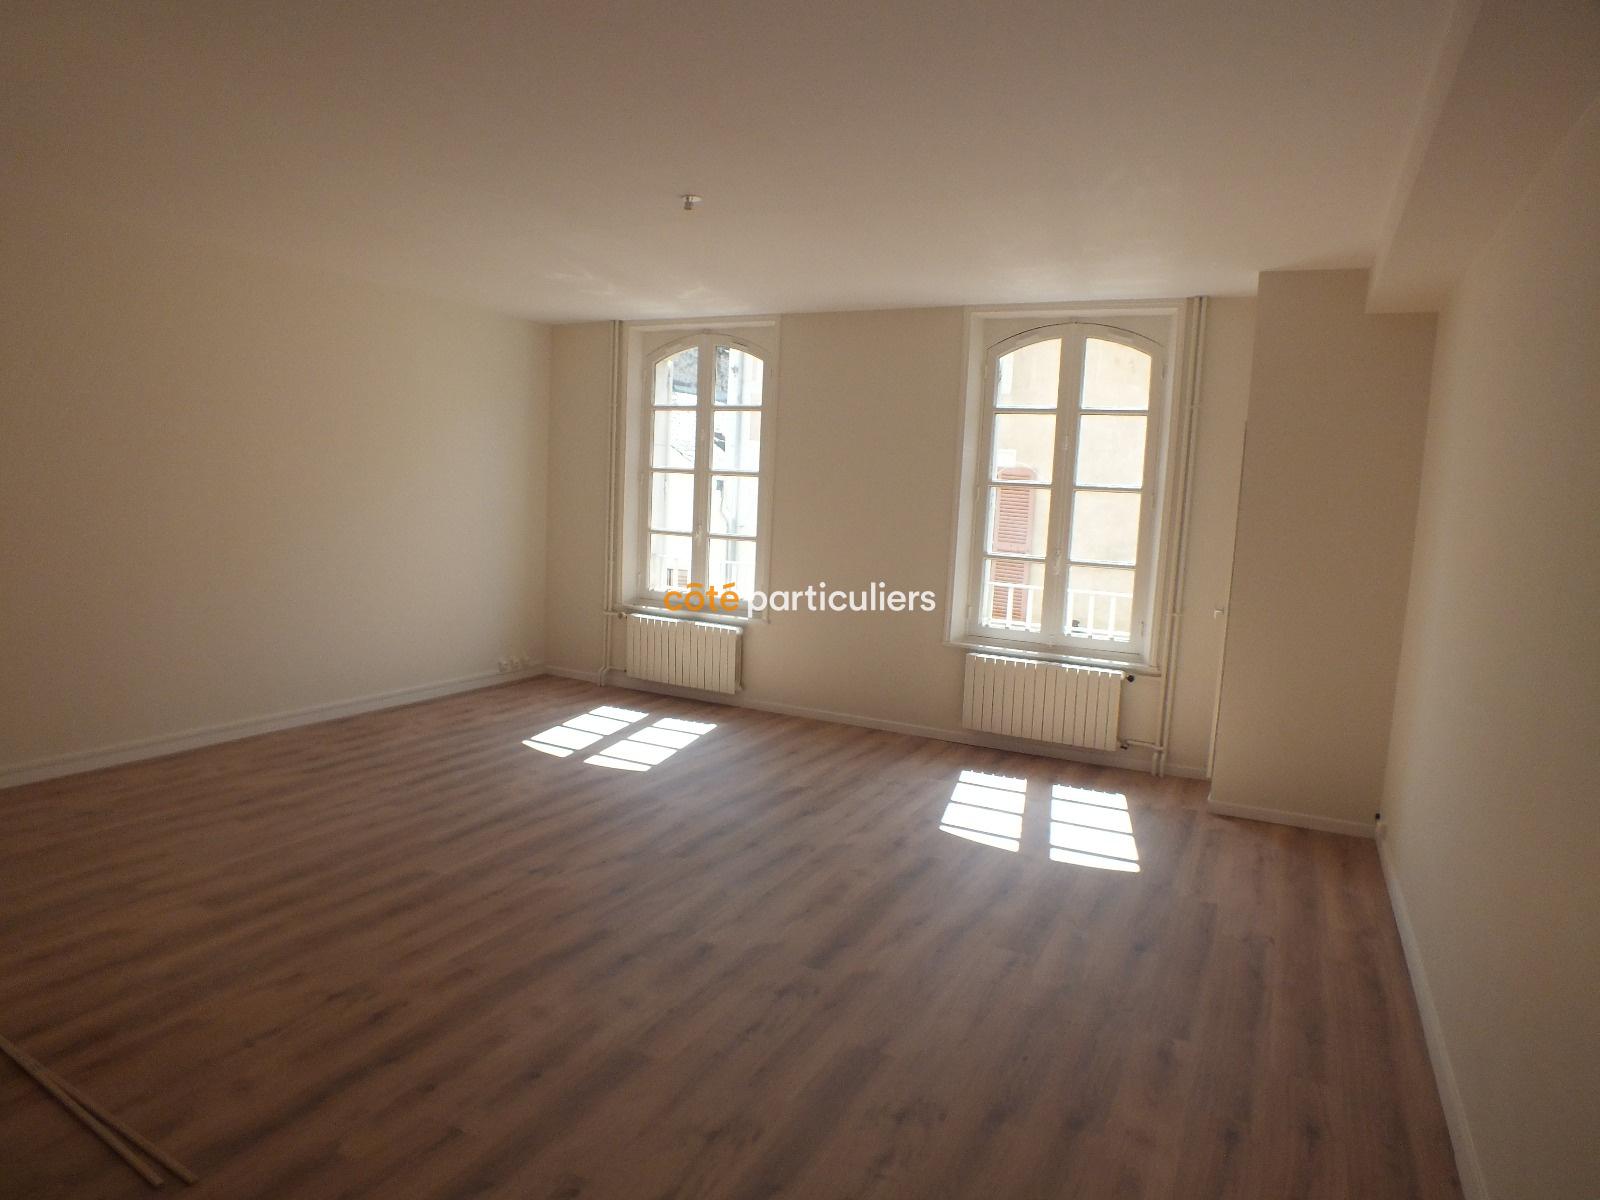 vente montargis centre ville. Black Bedroom Furniture Sets. Home Design Ideas